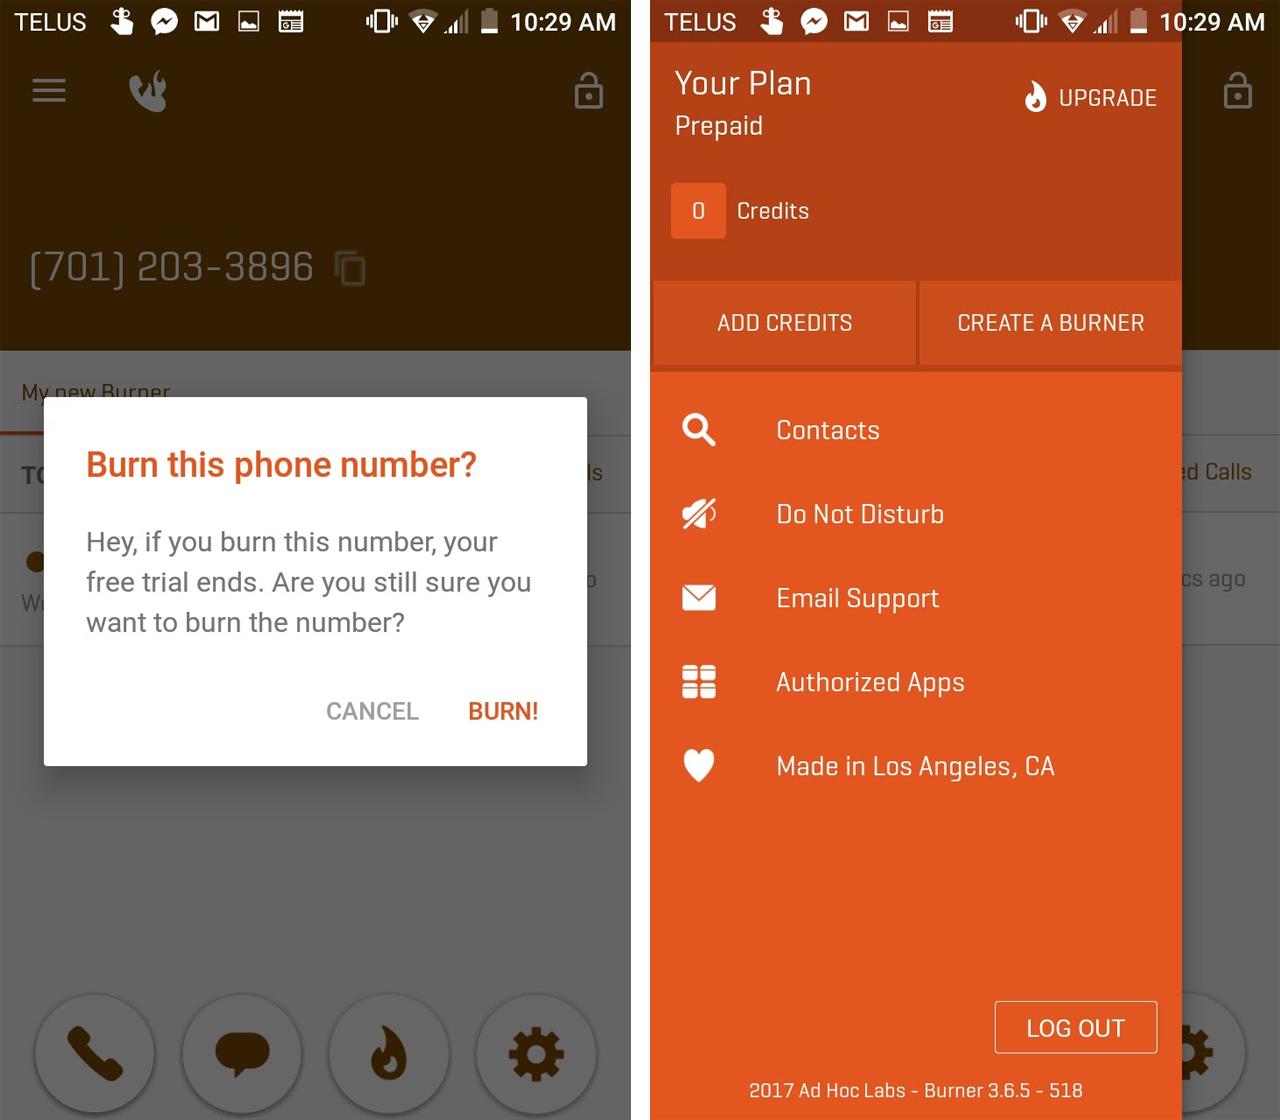 The context menu in the Burner app